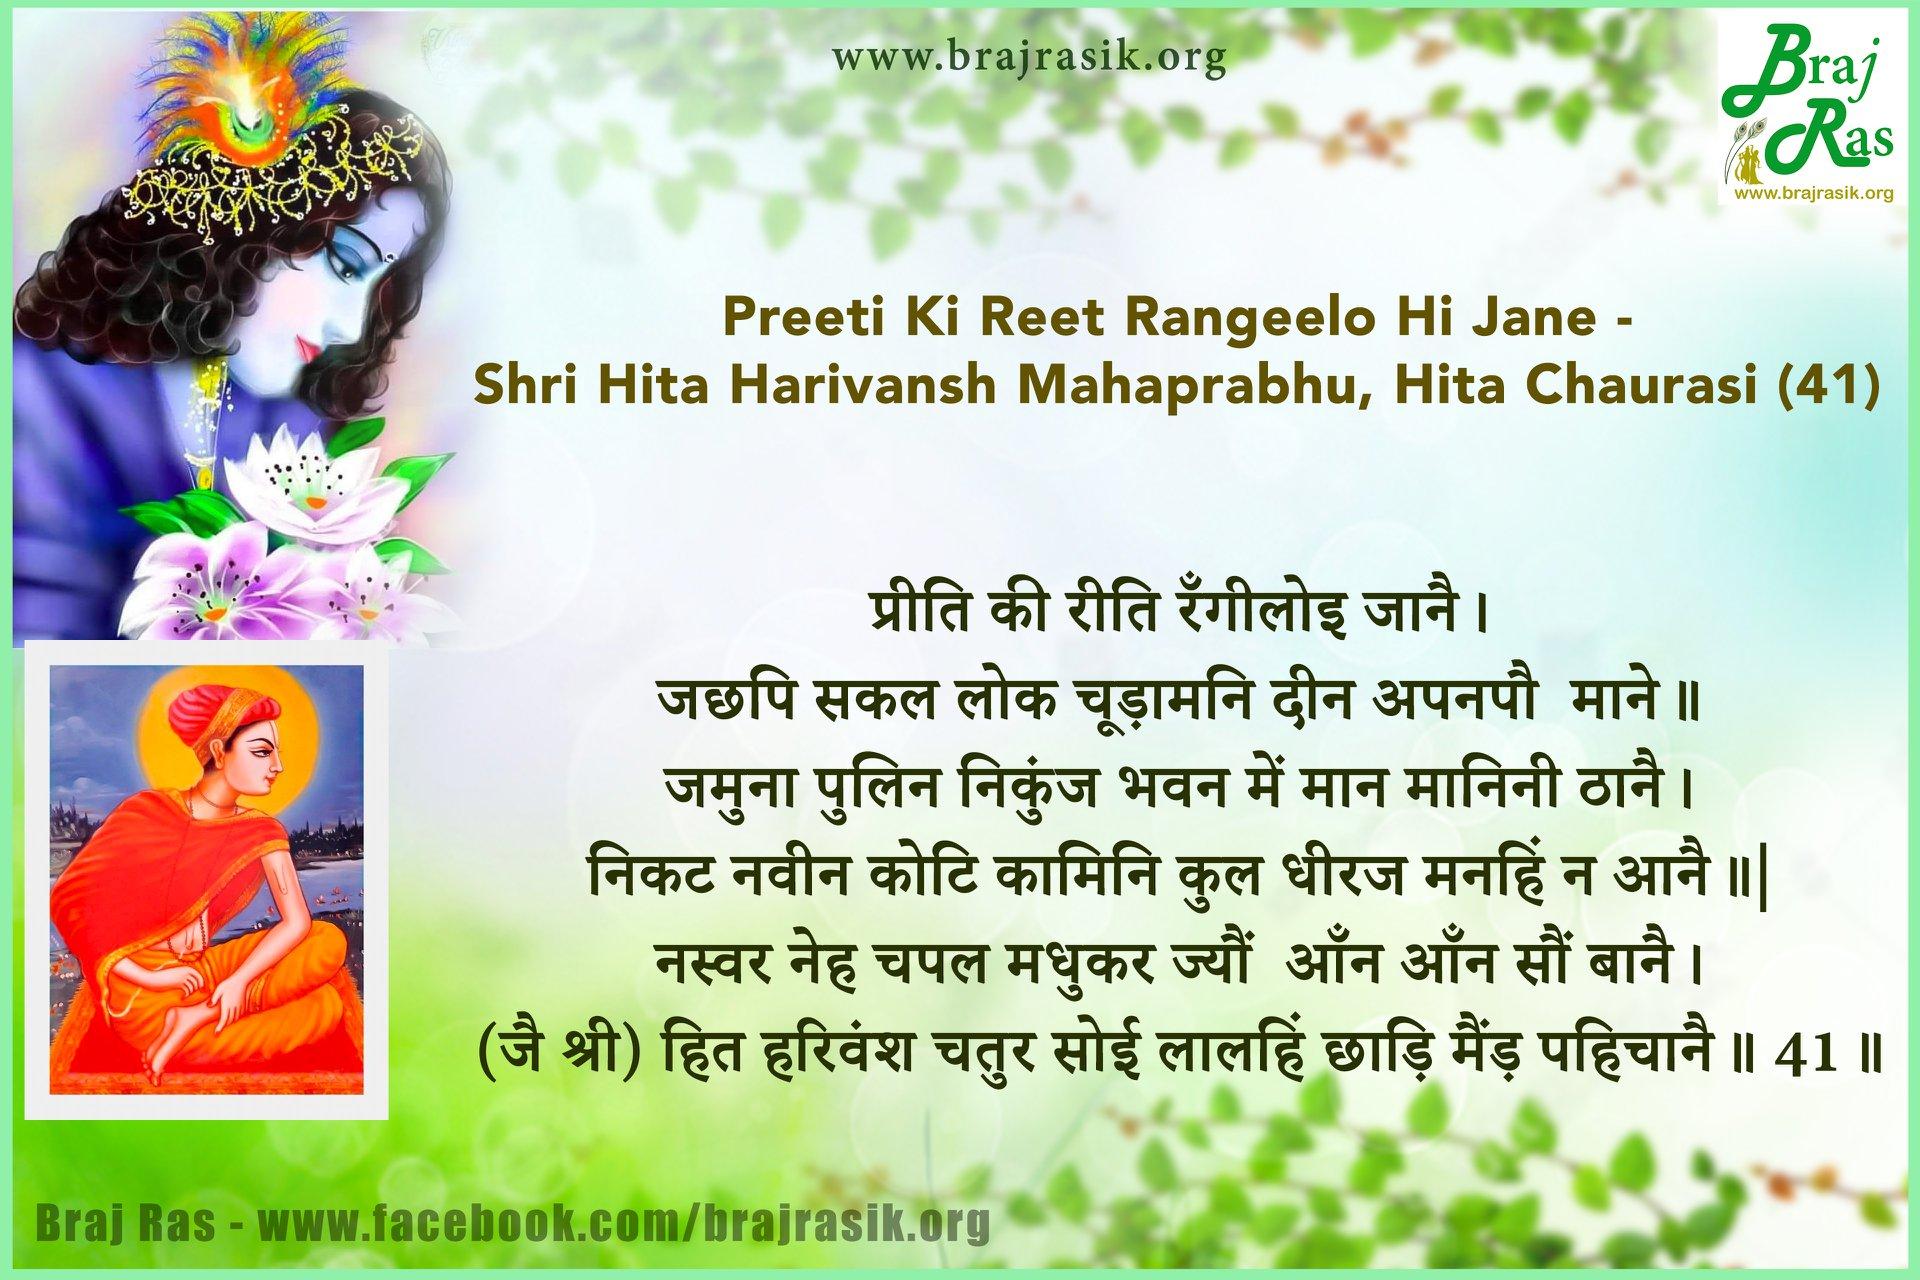 Preeti Ki Reeti Rangeelo Hi Jaane - Shri Hita Harivansh Mahaprabhu - Hit Chaturasi (41)